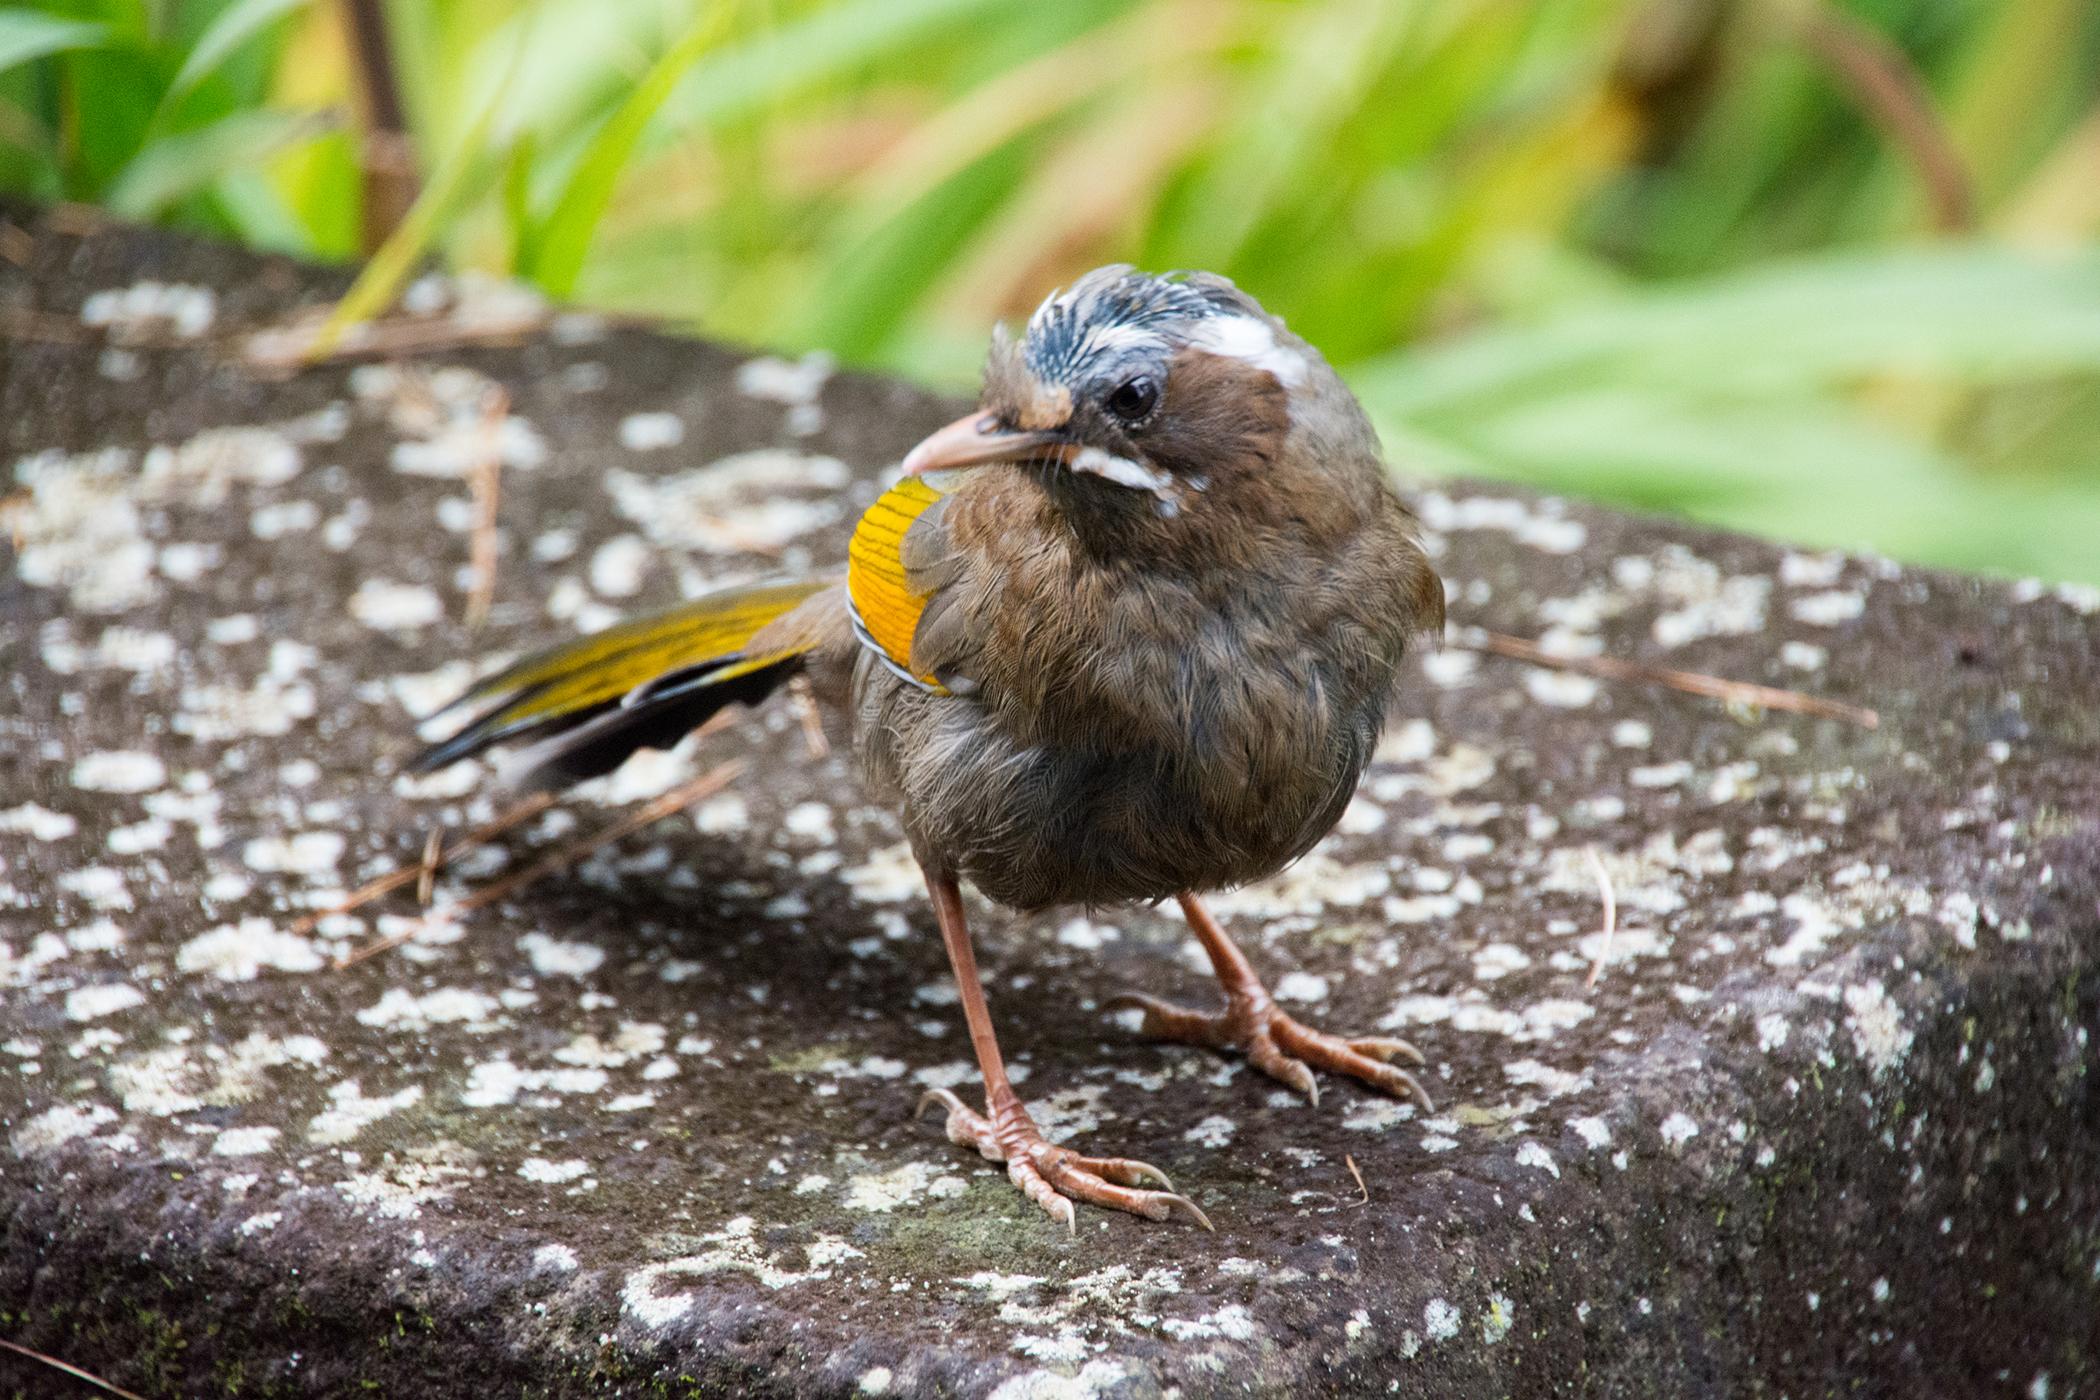 Poxvirus Infections in Birds